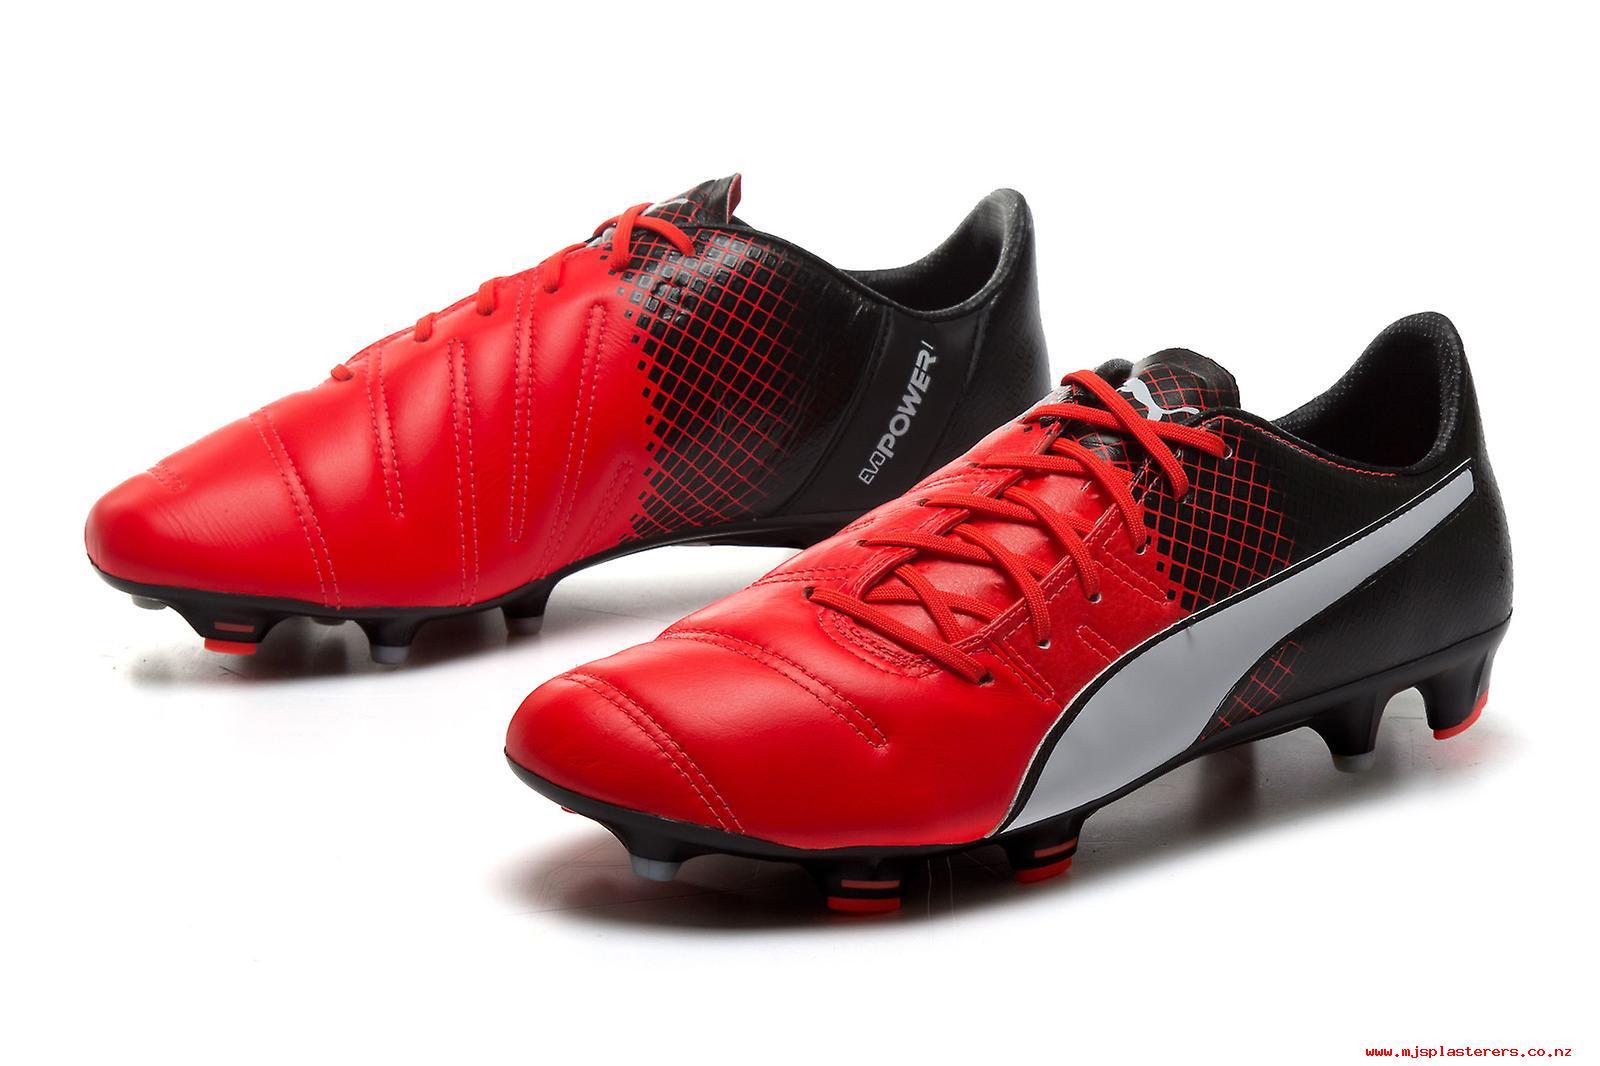 Puma evoPower 1.3 LTHR FG   Team Kits and Soccer United 49ea2911c